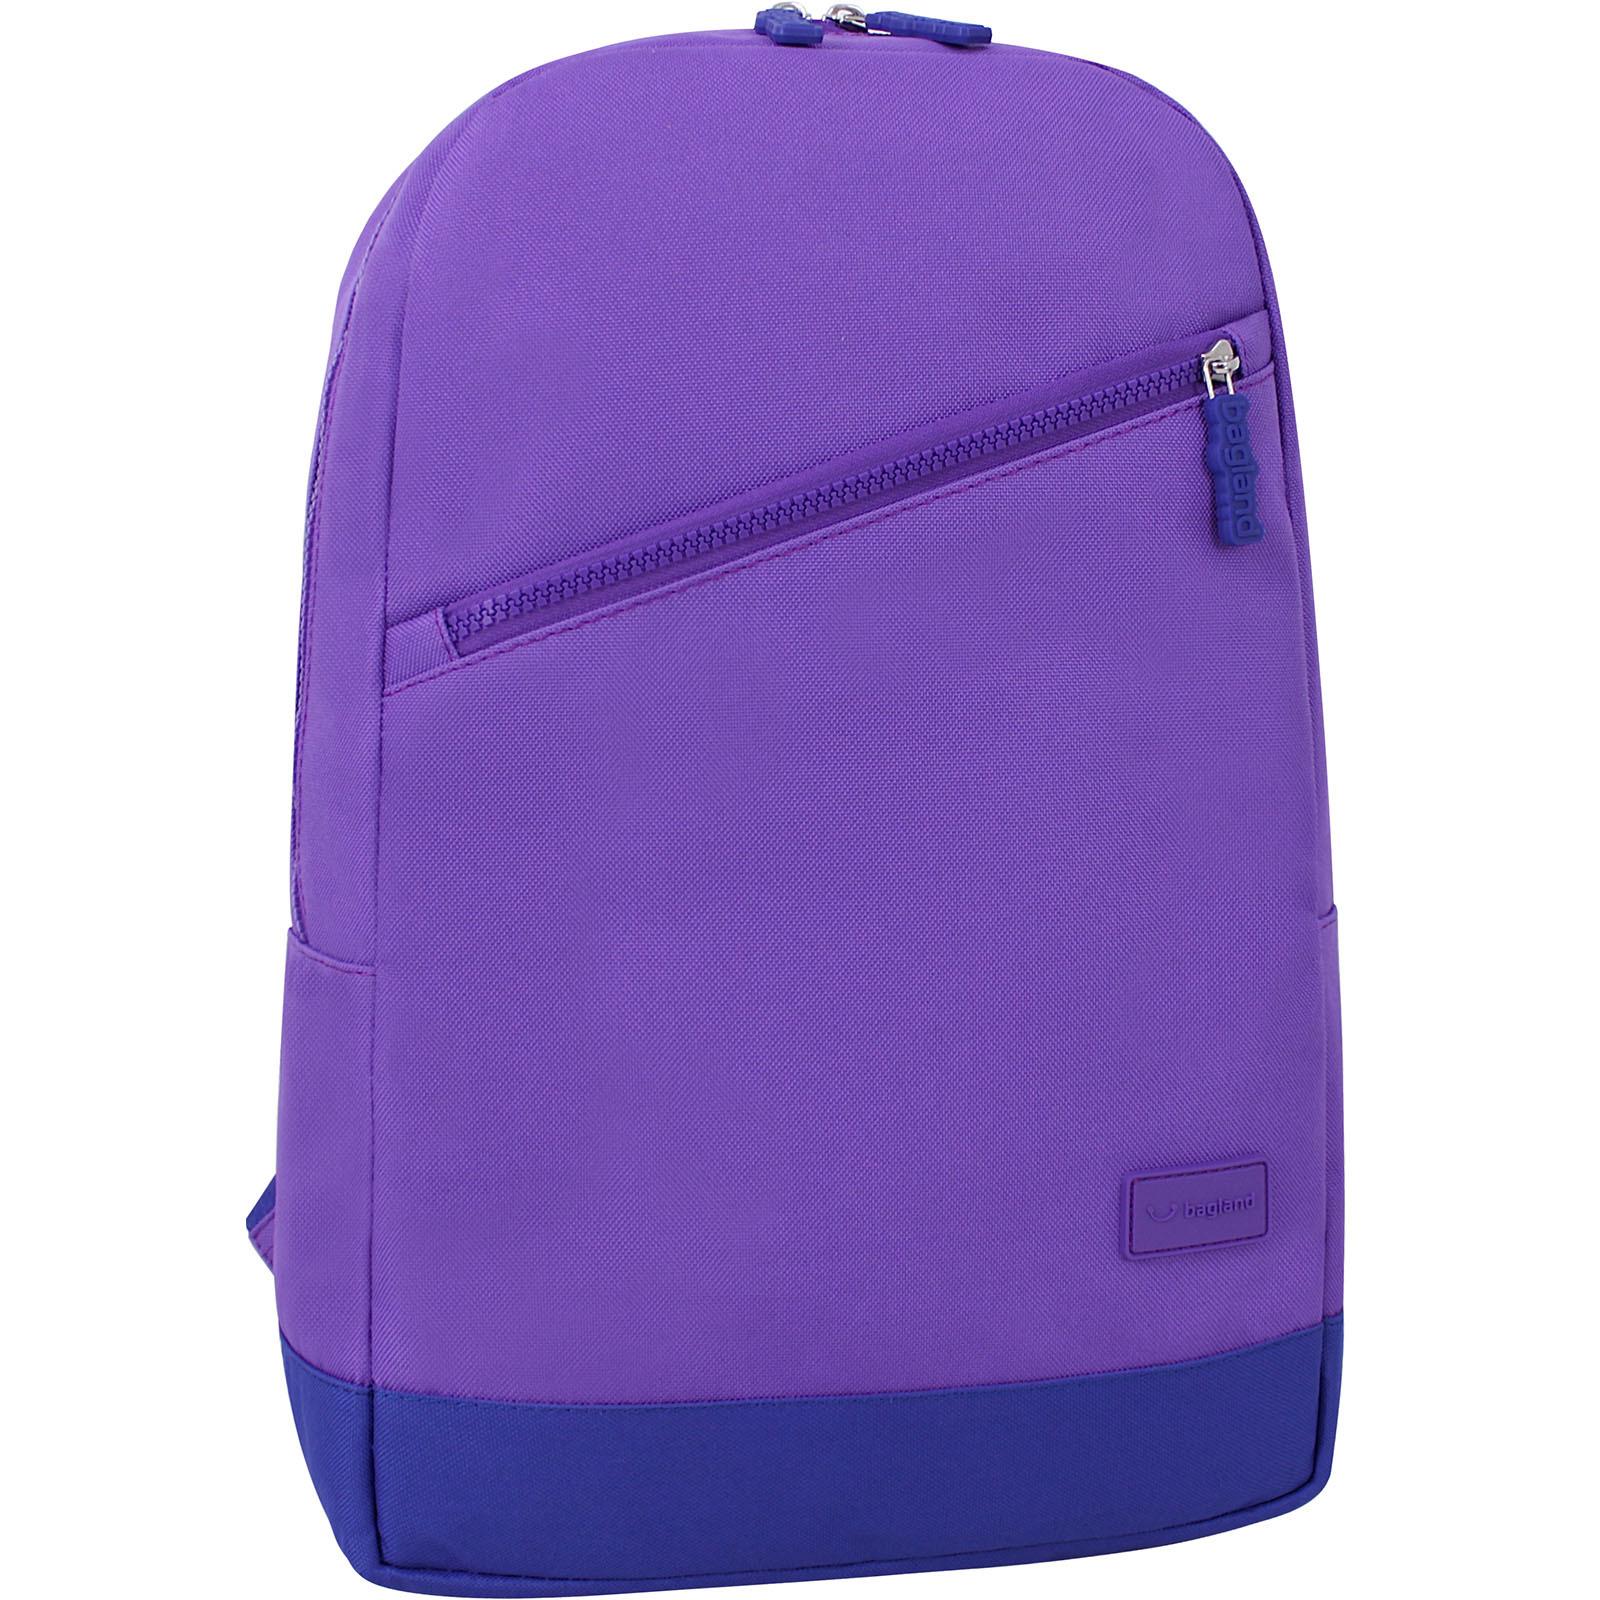 Новинки Рюкзак Bagland Amber 15 л. фиолетовый/электрик (0010466) IMG_9788_170._електрик_.JPG